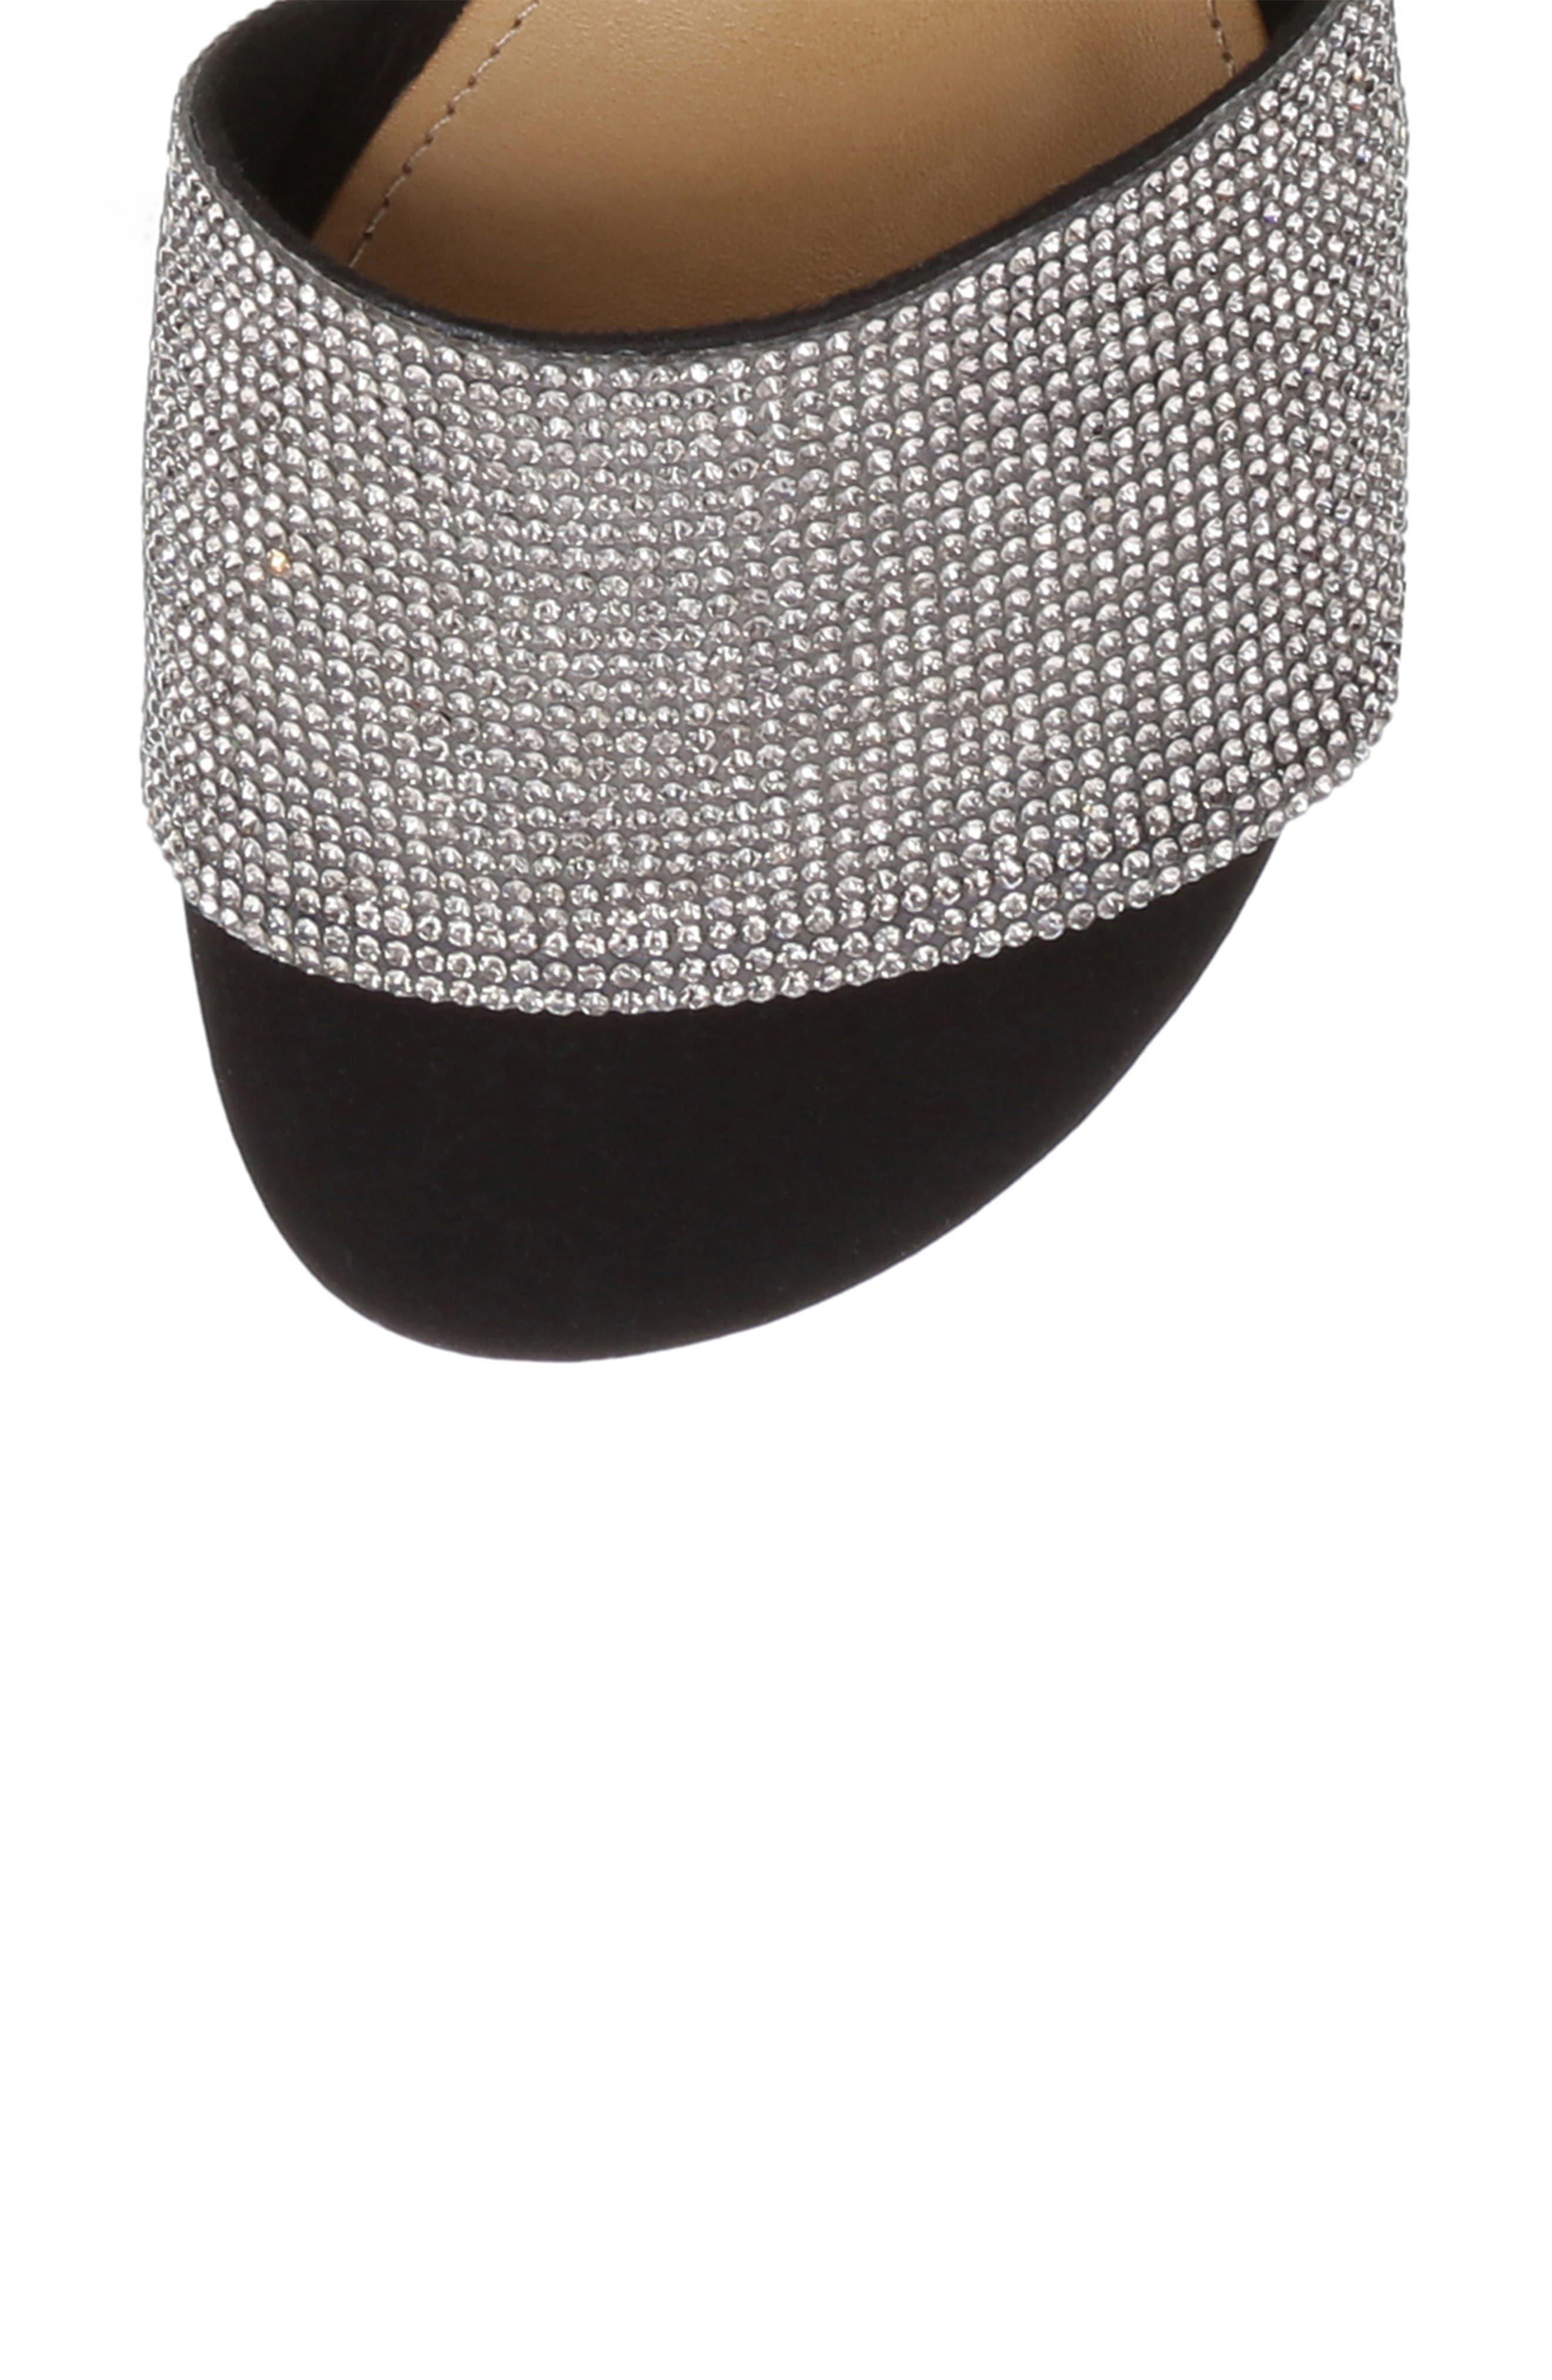 SCHUTZ, Queren Embellished Slide Sandal, Alternate thumbnail 6, color, BLACK/ BLACK DIAMOND FABRIC